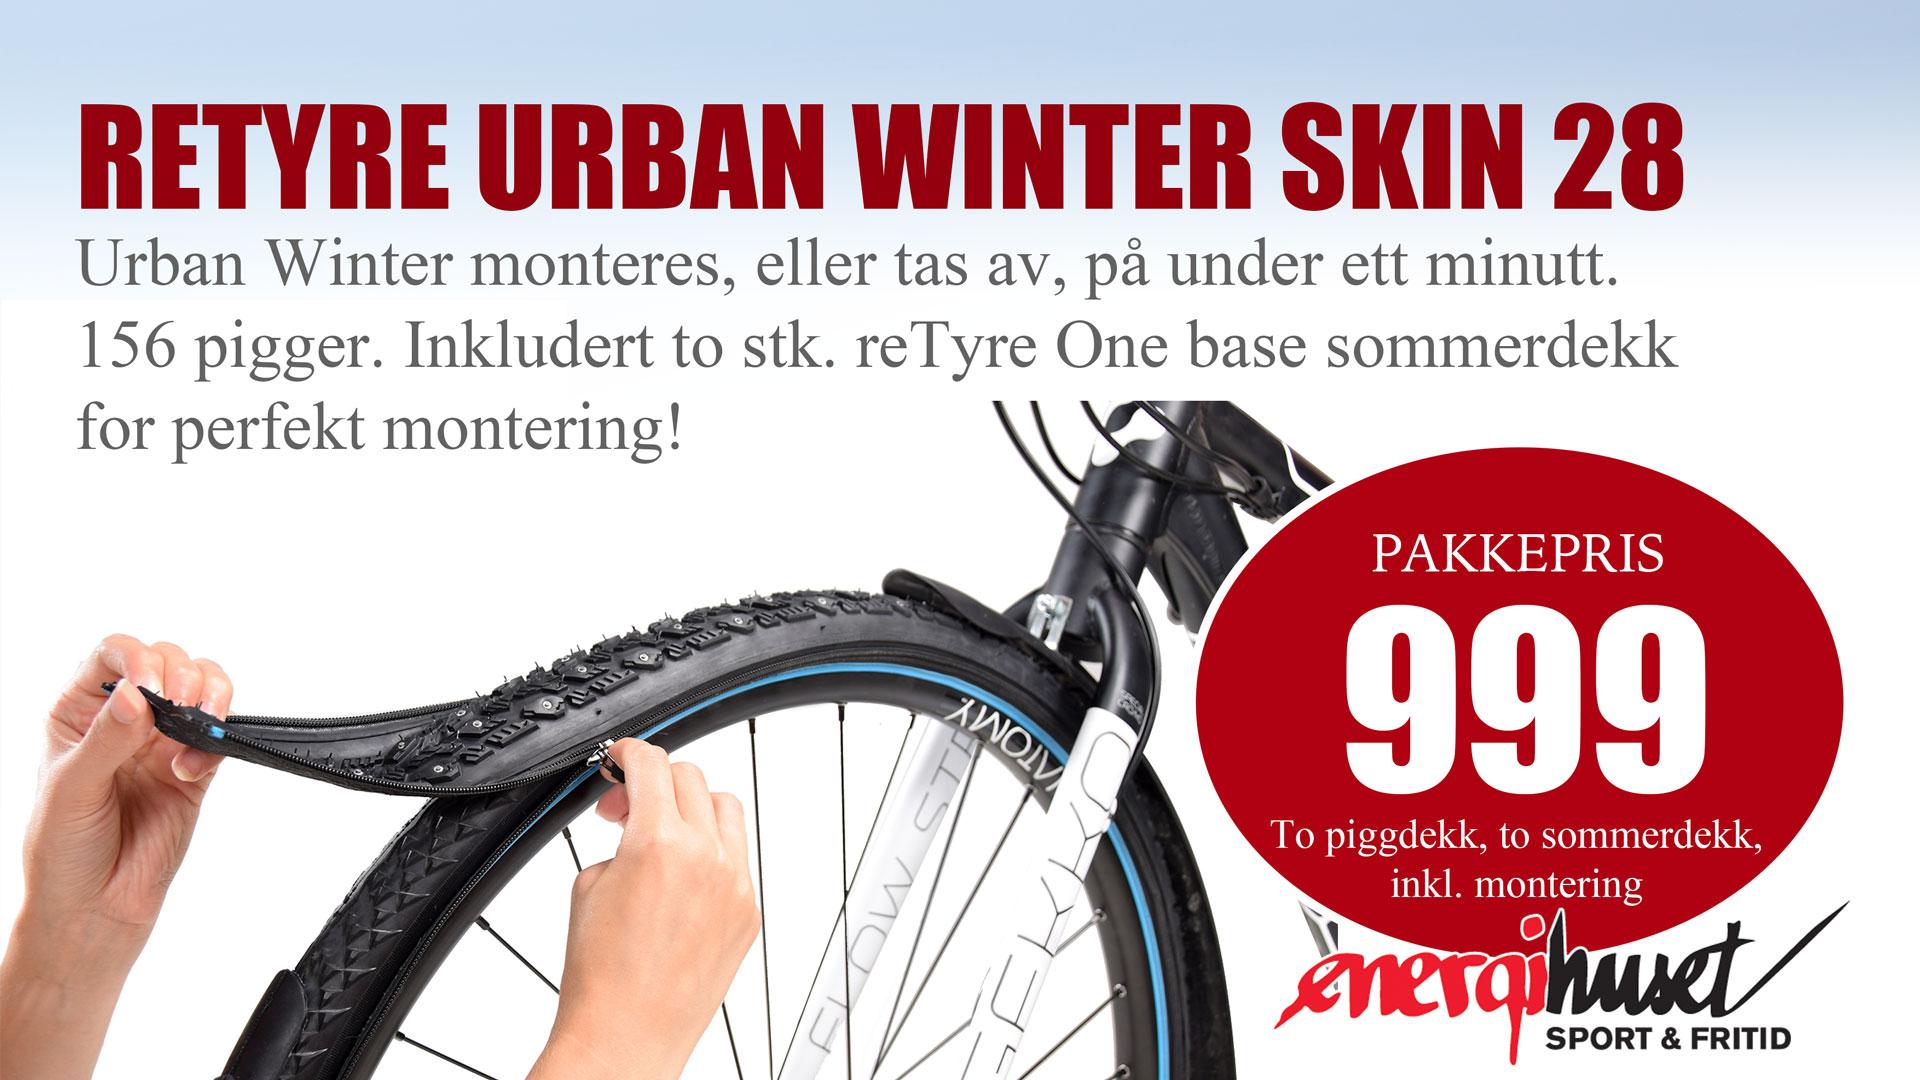 skjerm_Retyre-Urban-winter-skin-28